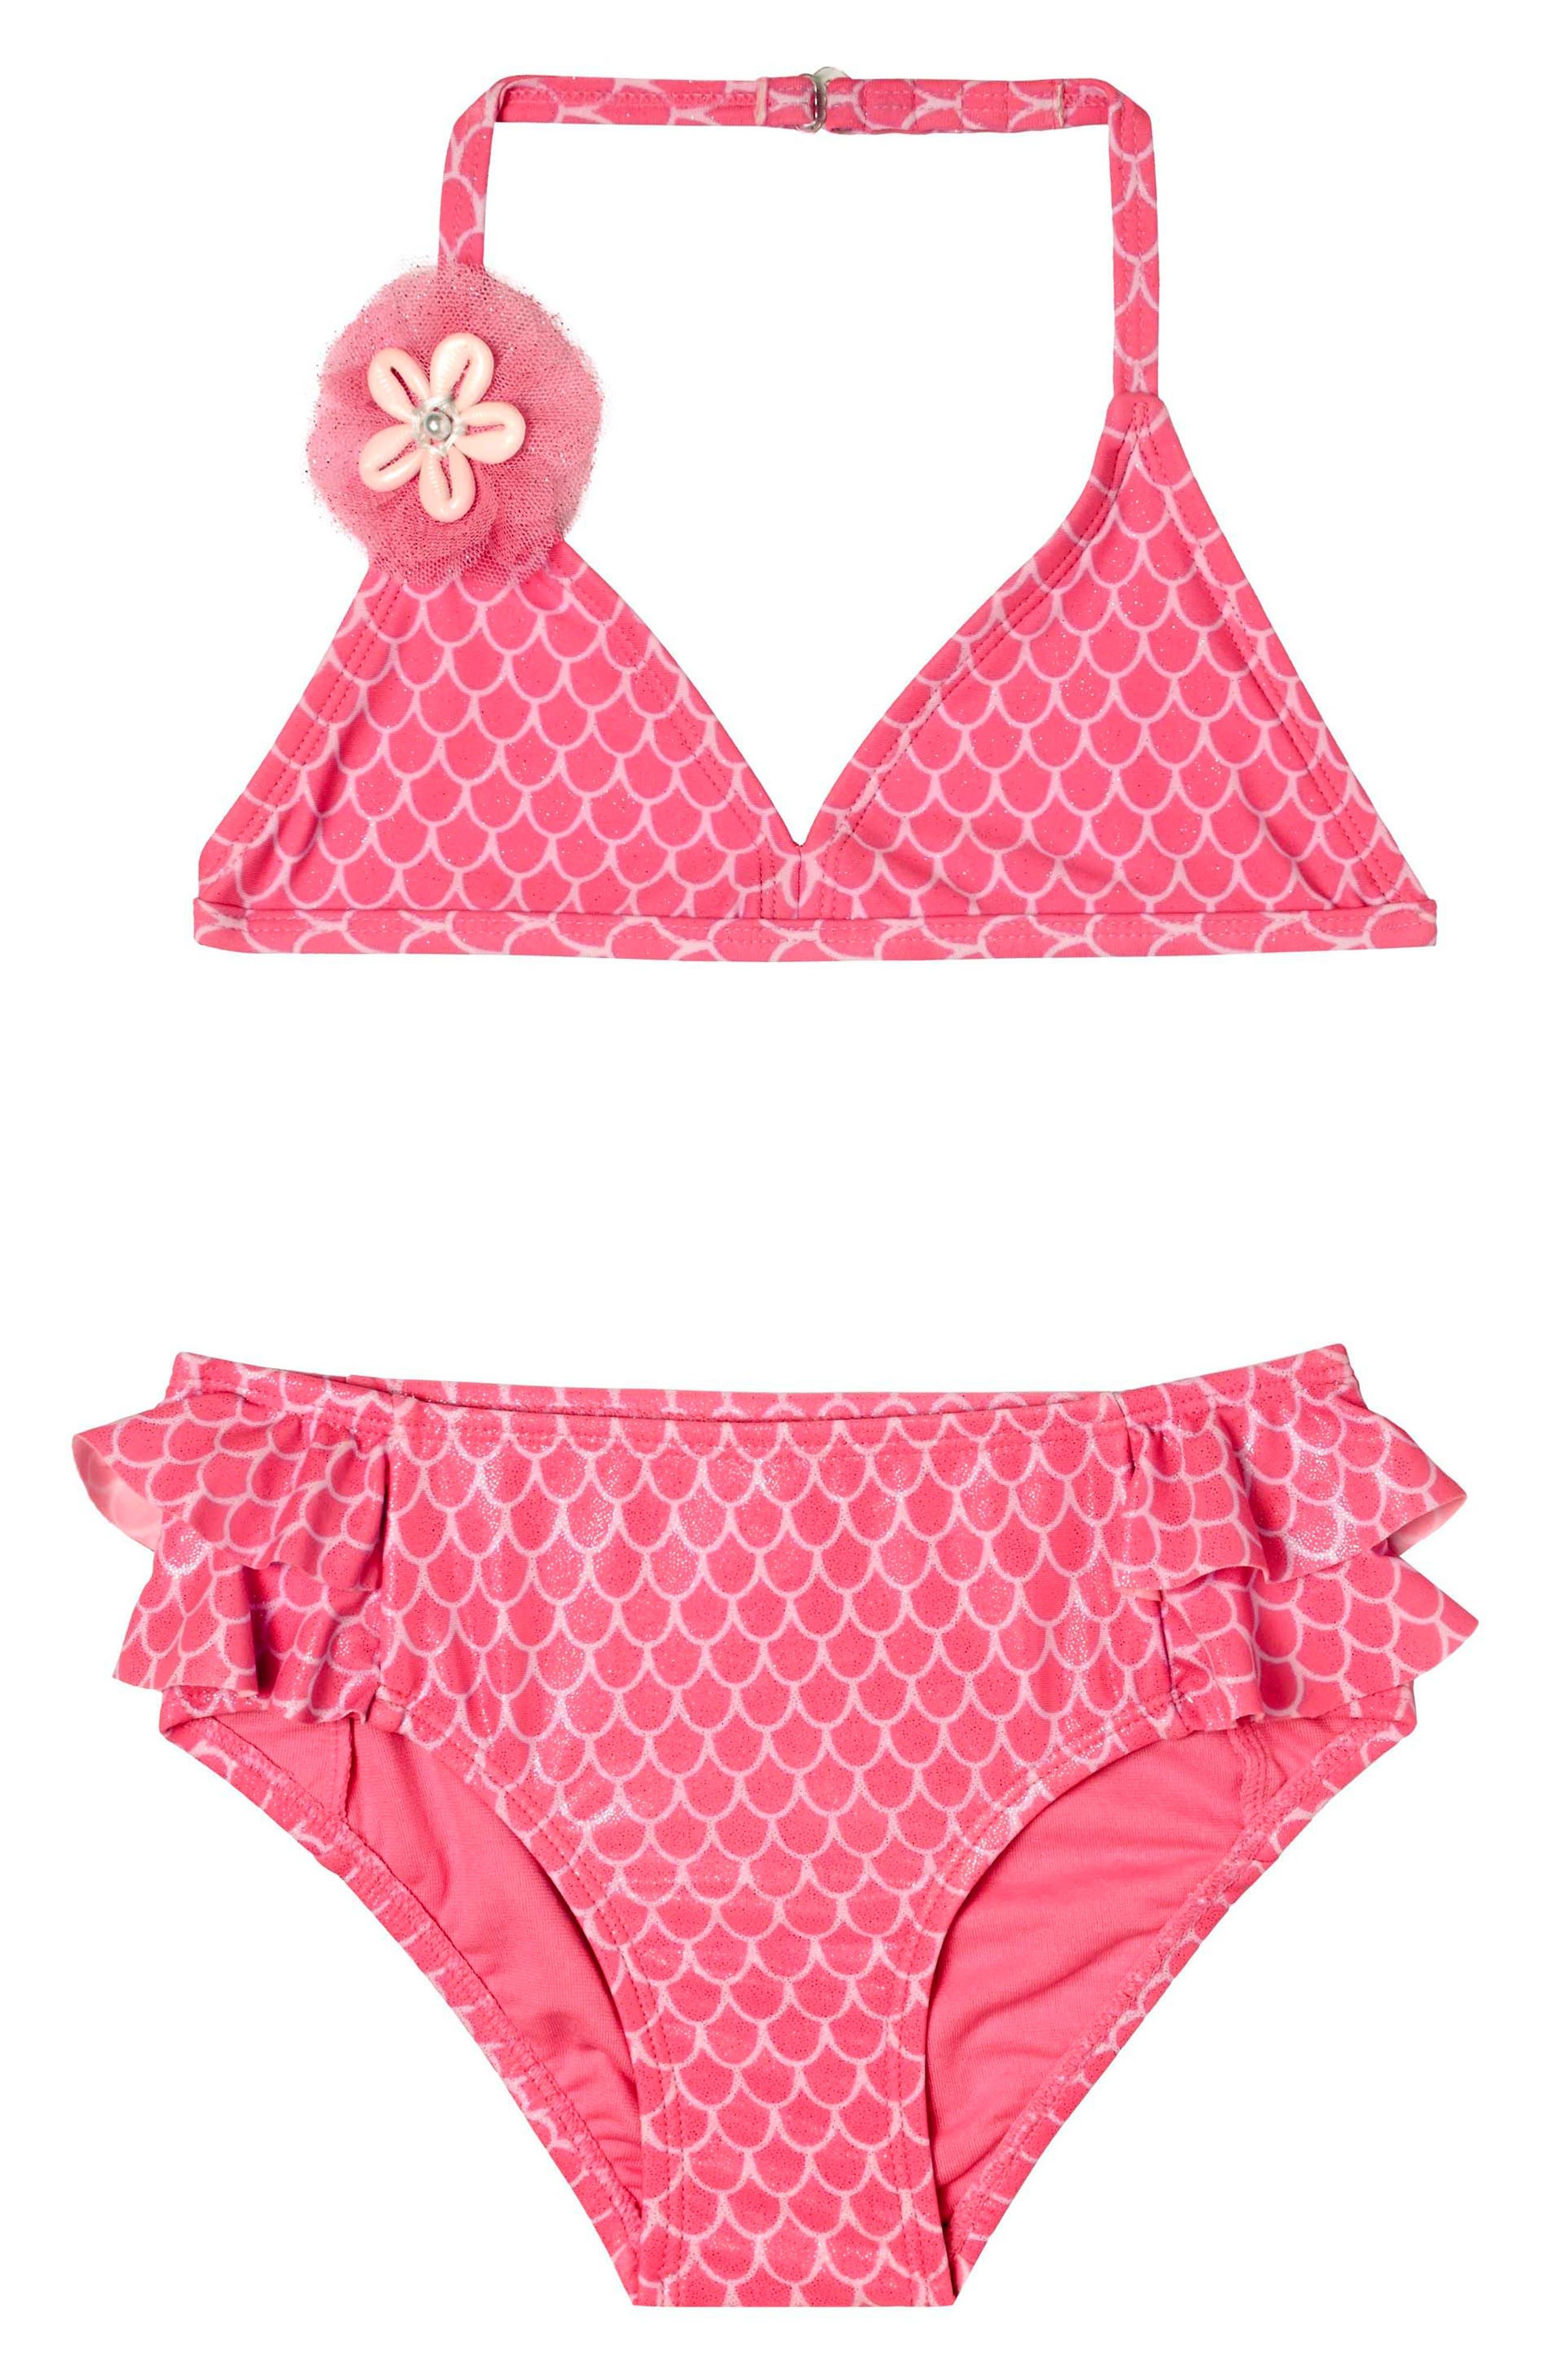 Main Image - Hula Star Mermaid Princess Two-Piece Swimsuit (Toddler Girls & Little Girls)